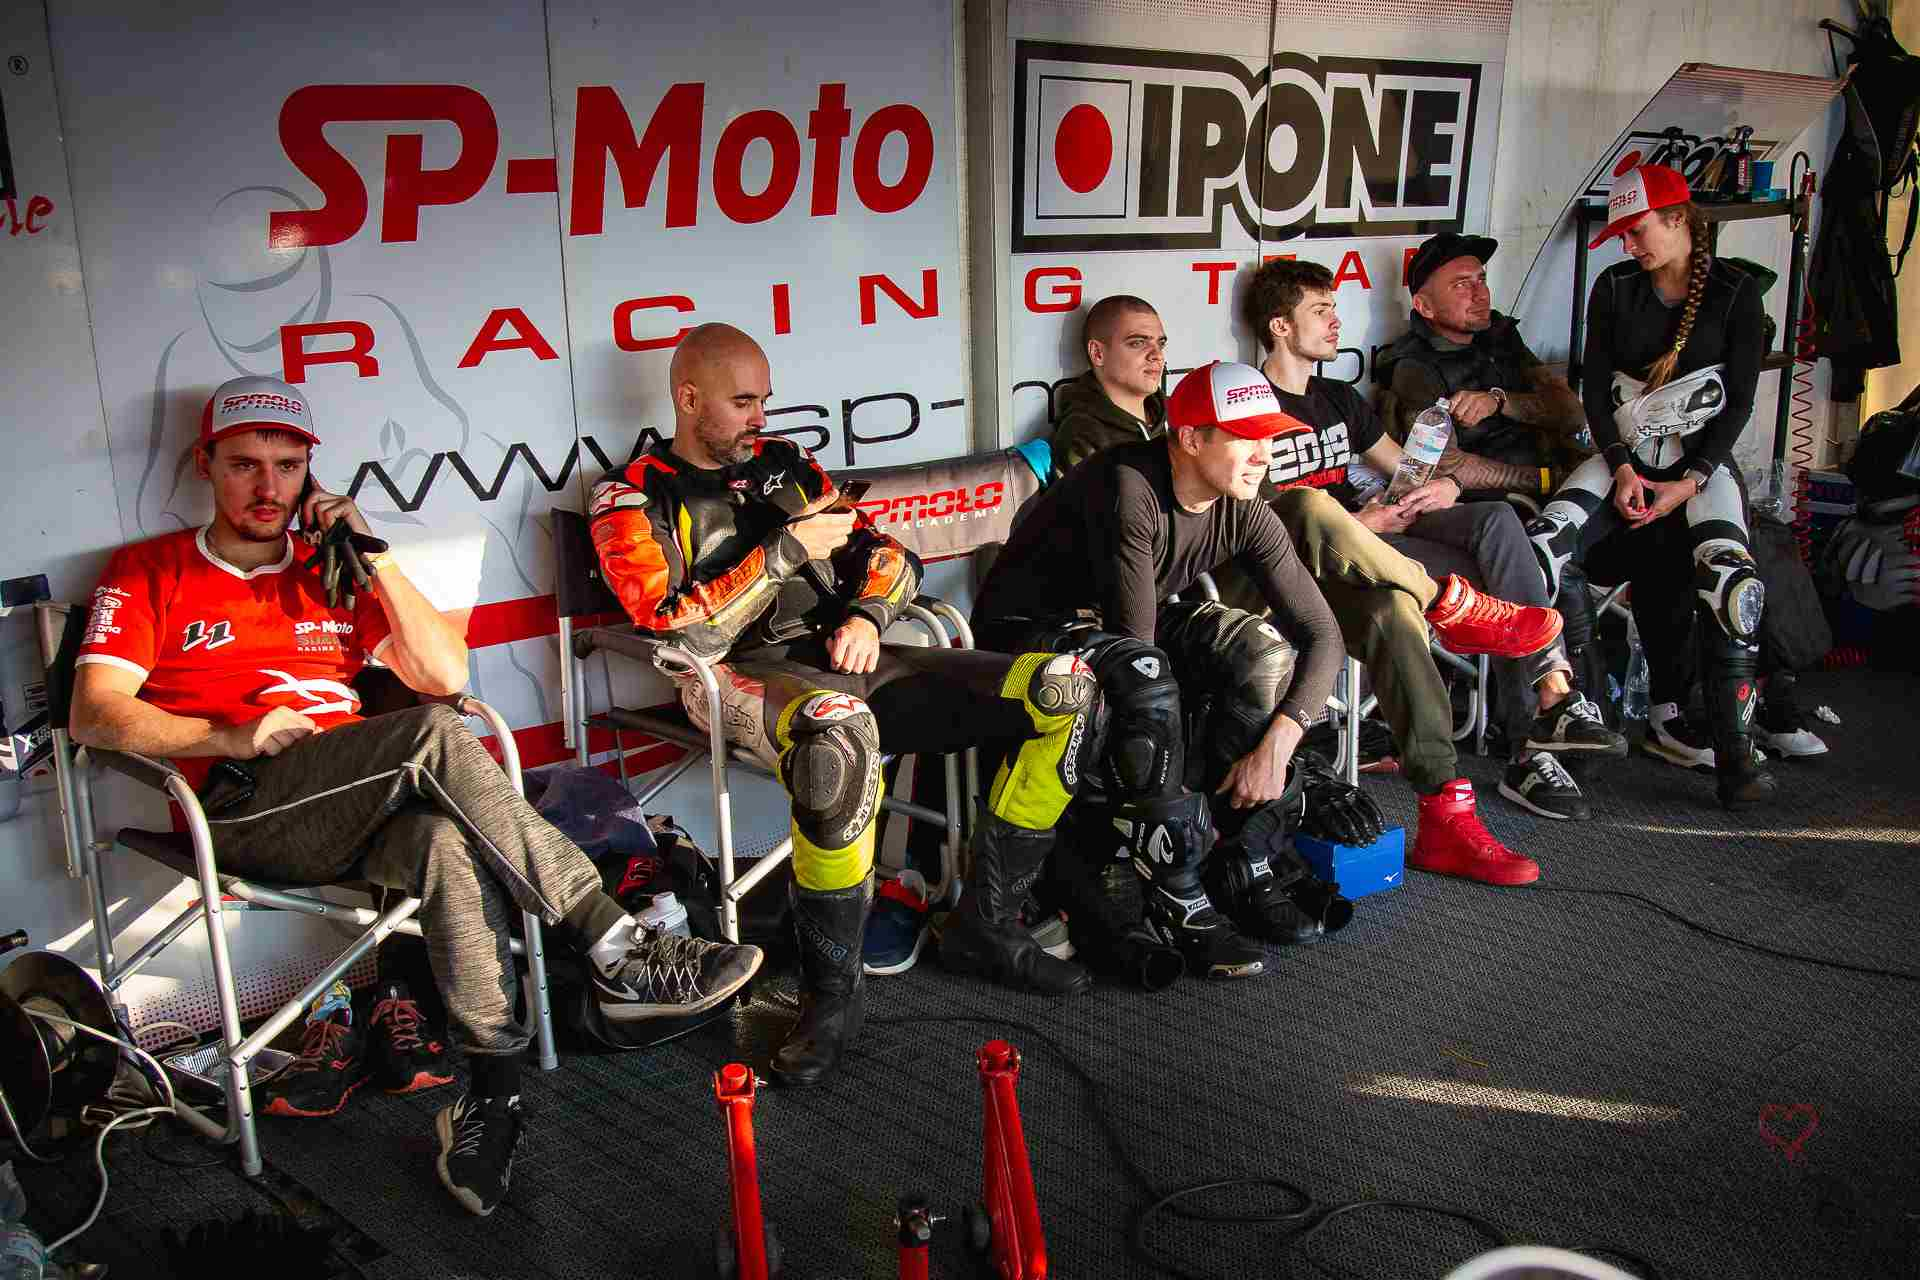 5-6_etap_MotoGPUkraine_003